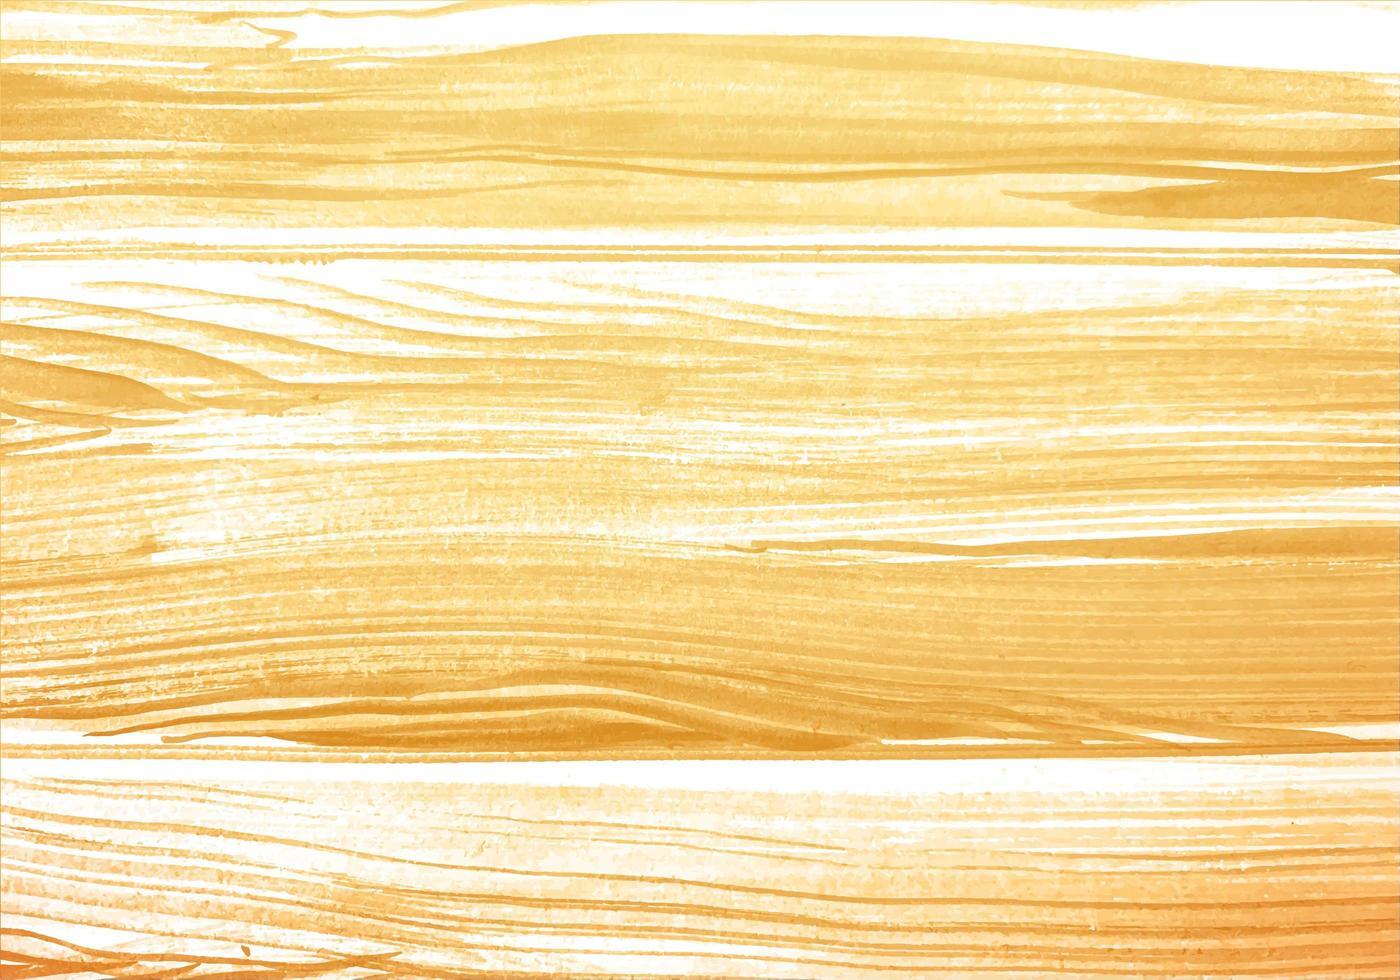 Light Yellow Wooden Texture vector